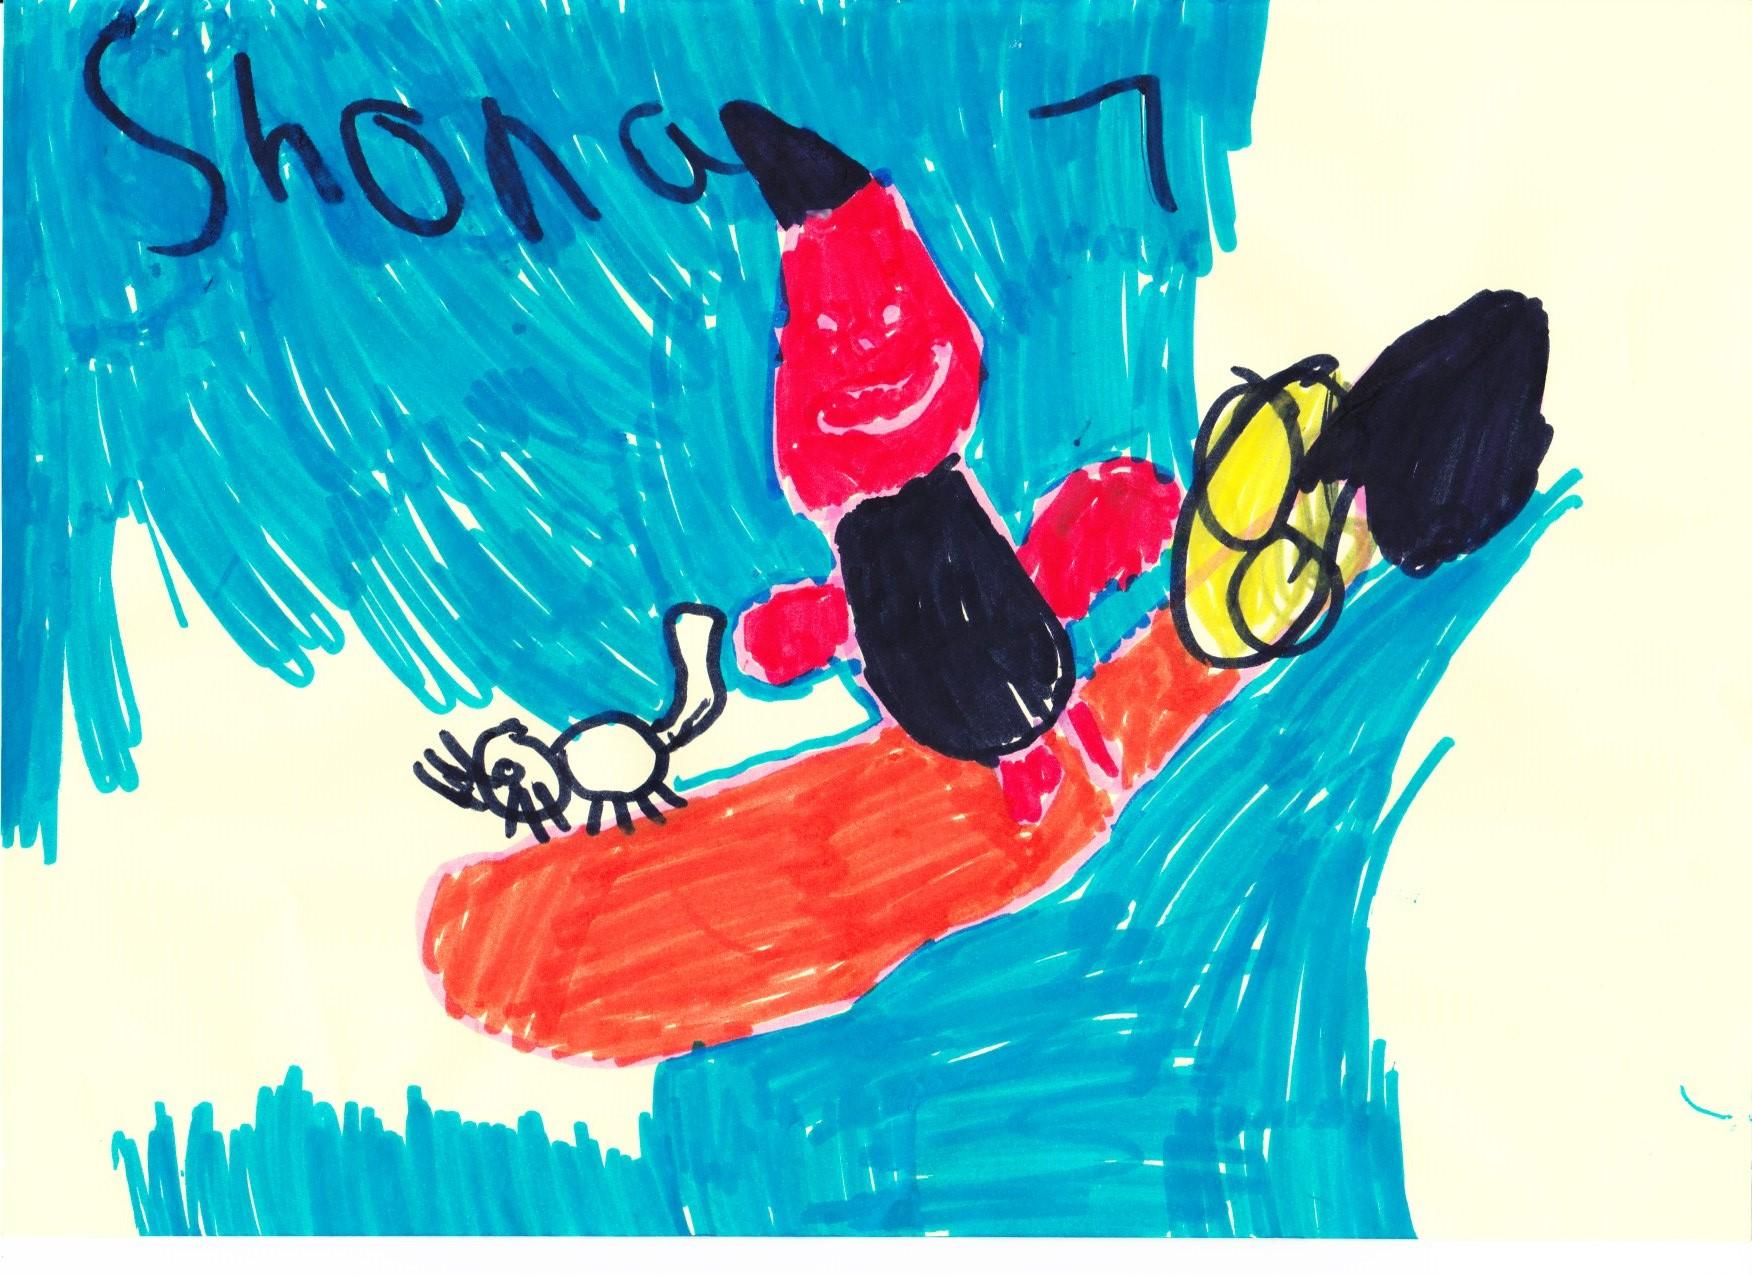 Shona Steel, age 7